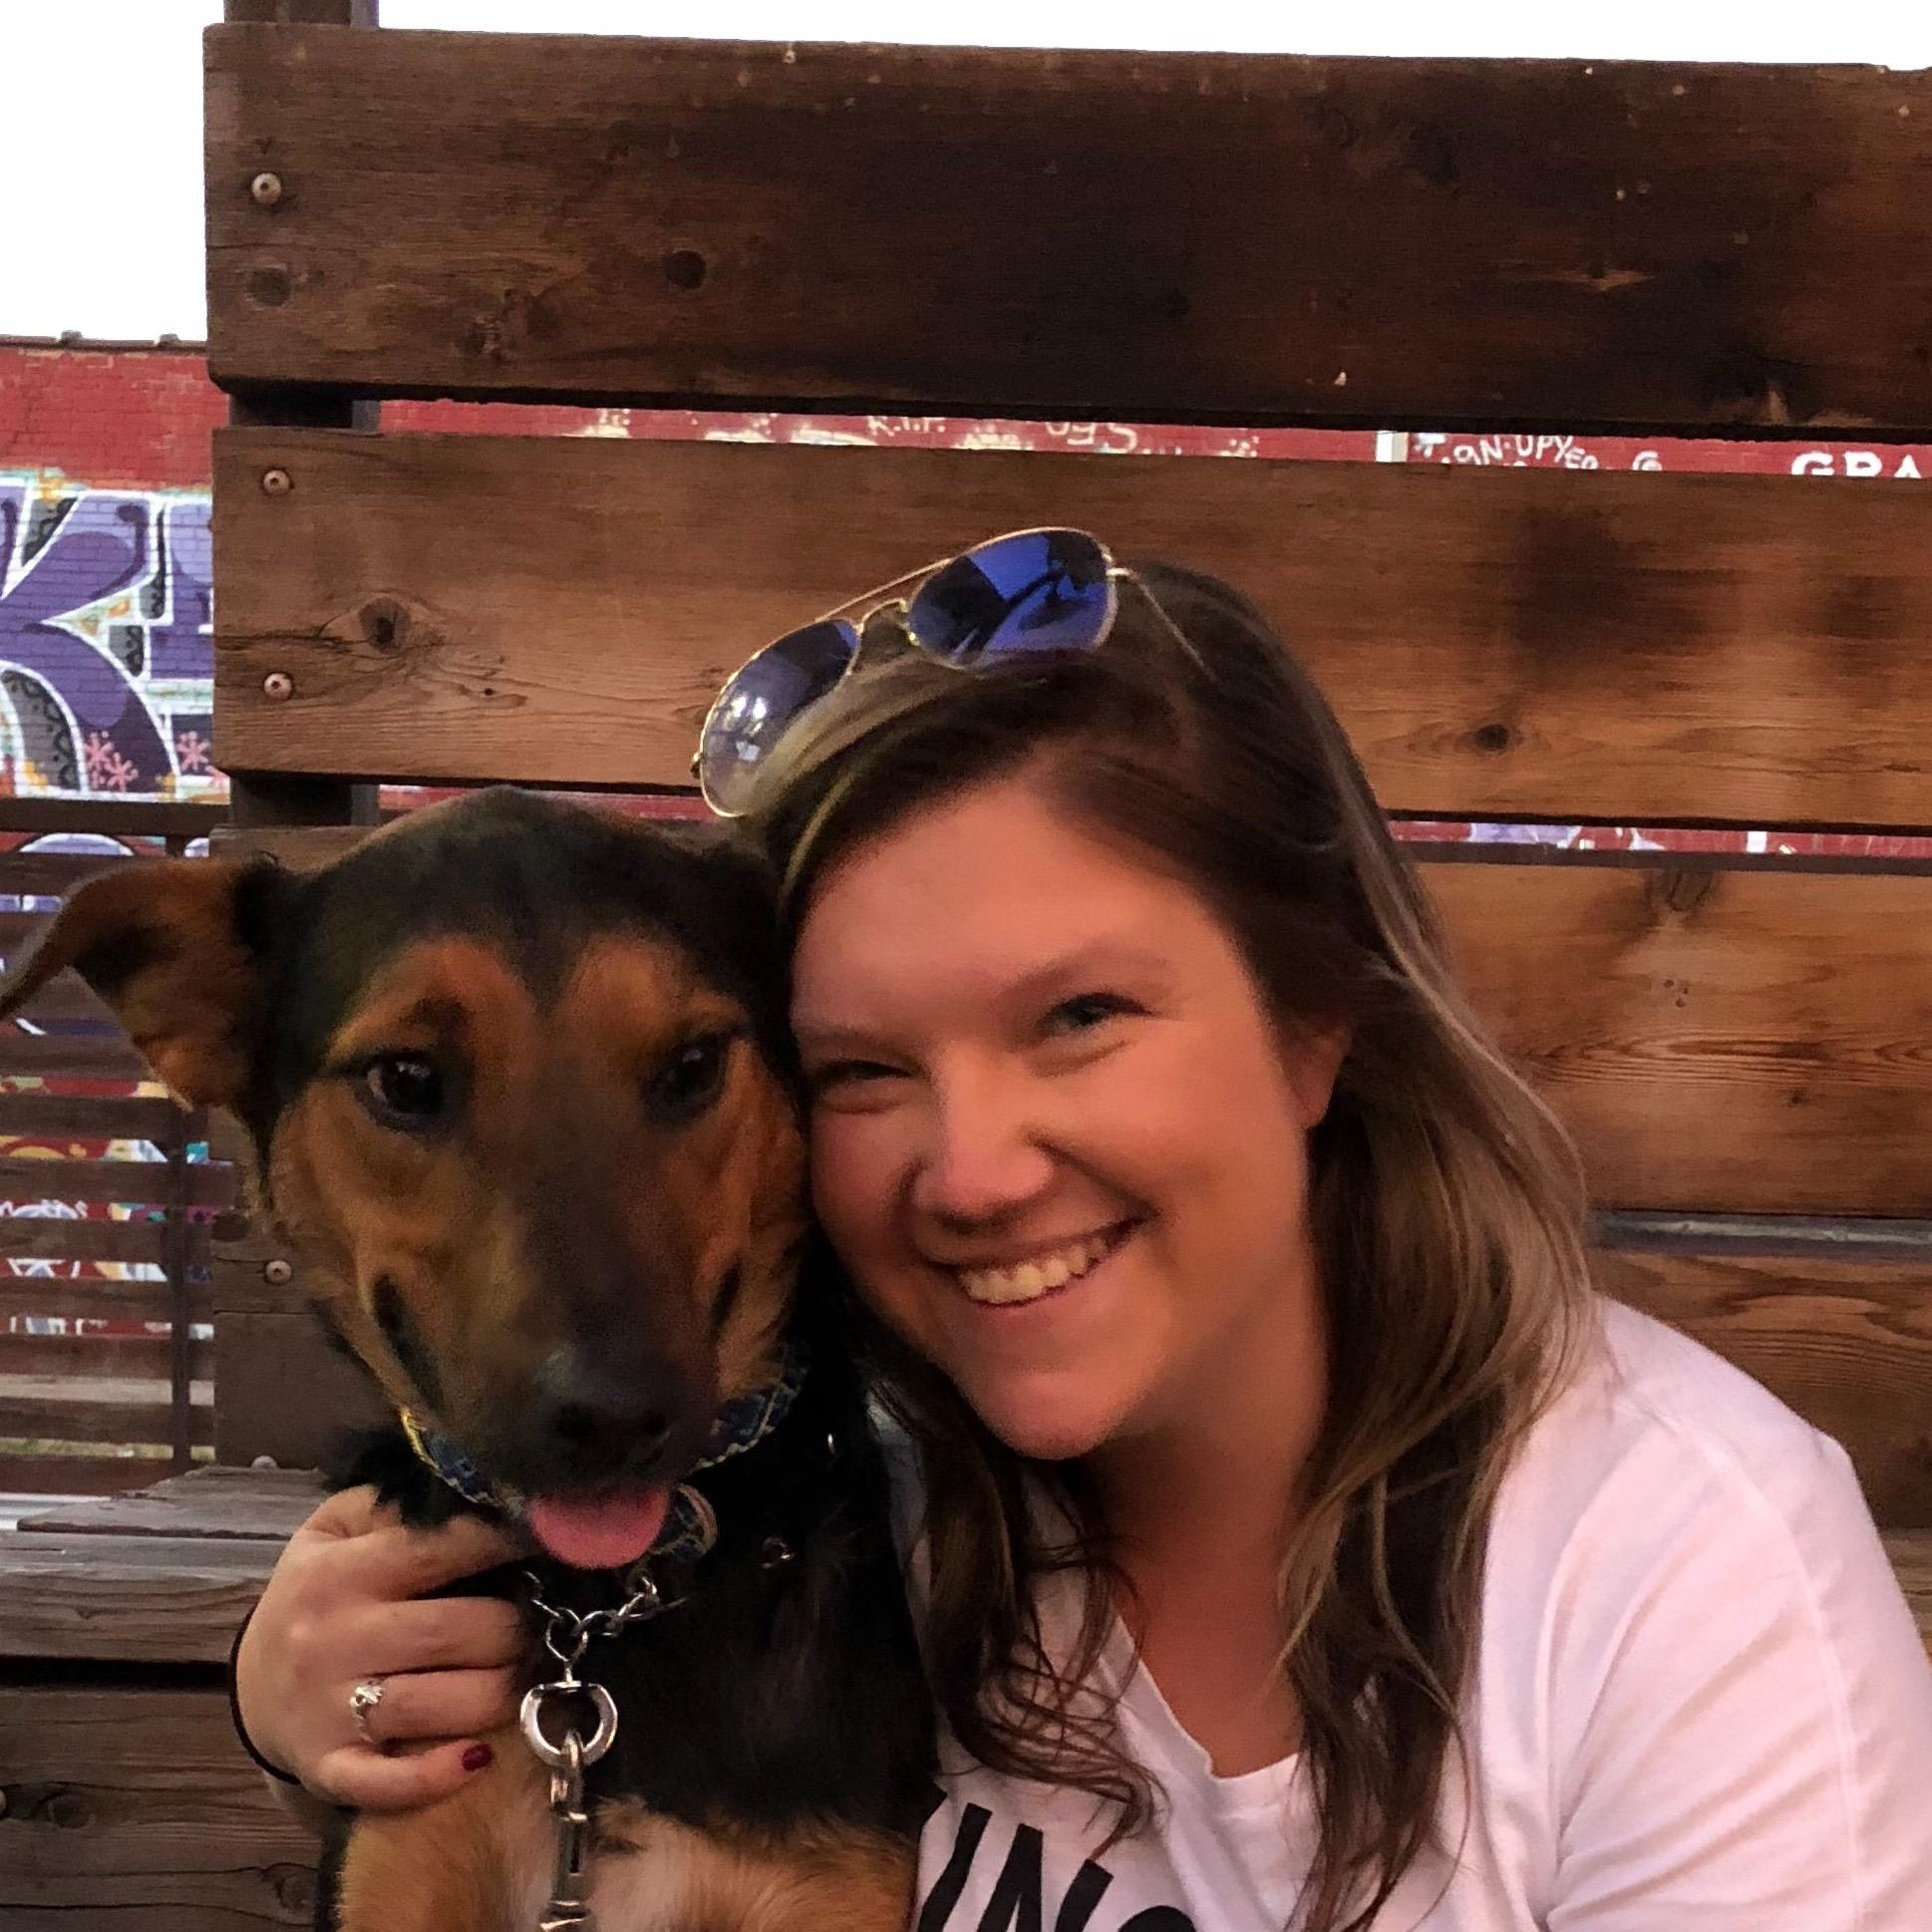 Mikayla's dog day care